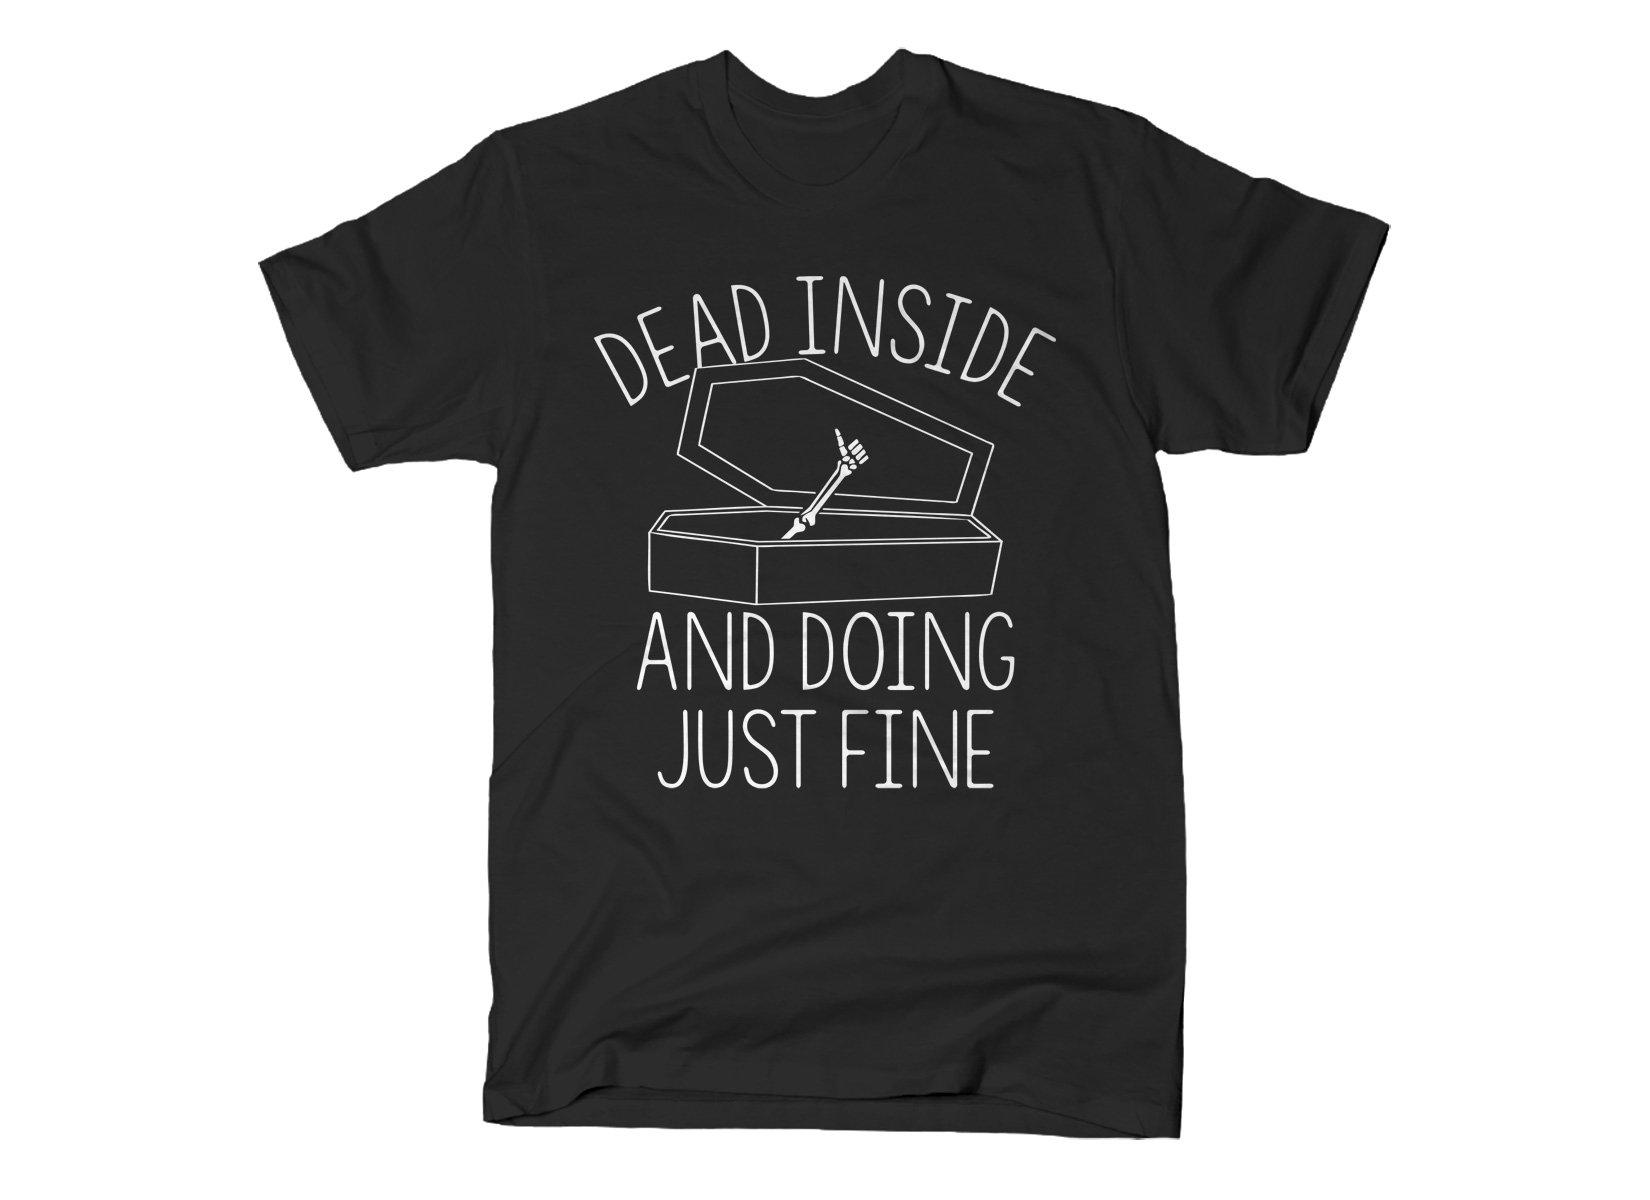 Dead Inside And Doing Fine on Mens T-Shirt